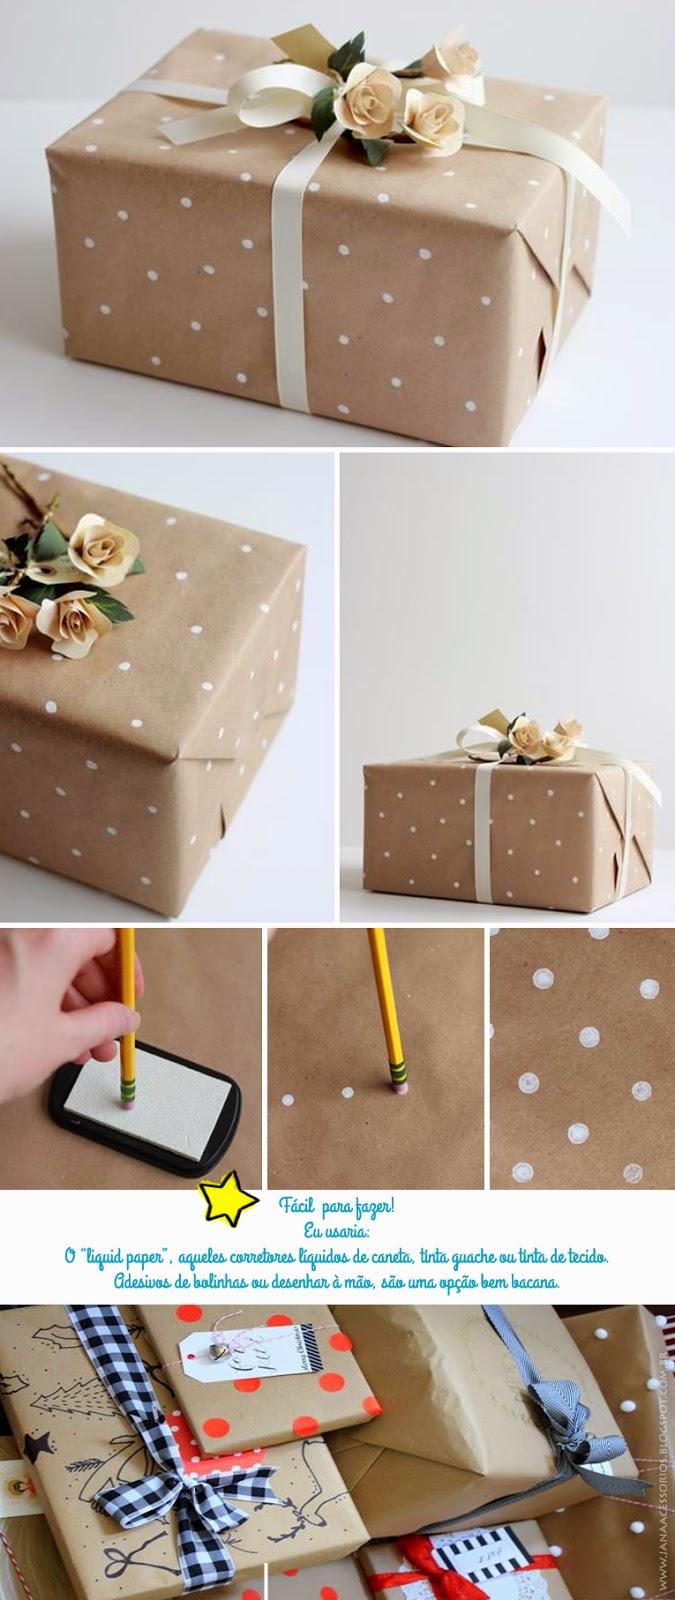 blog da jana, blog de acessórios, embalagens criativas, diy, joinville, blogger, blogueira, DIY - Embalagens